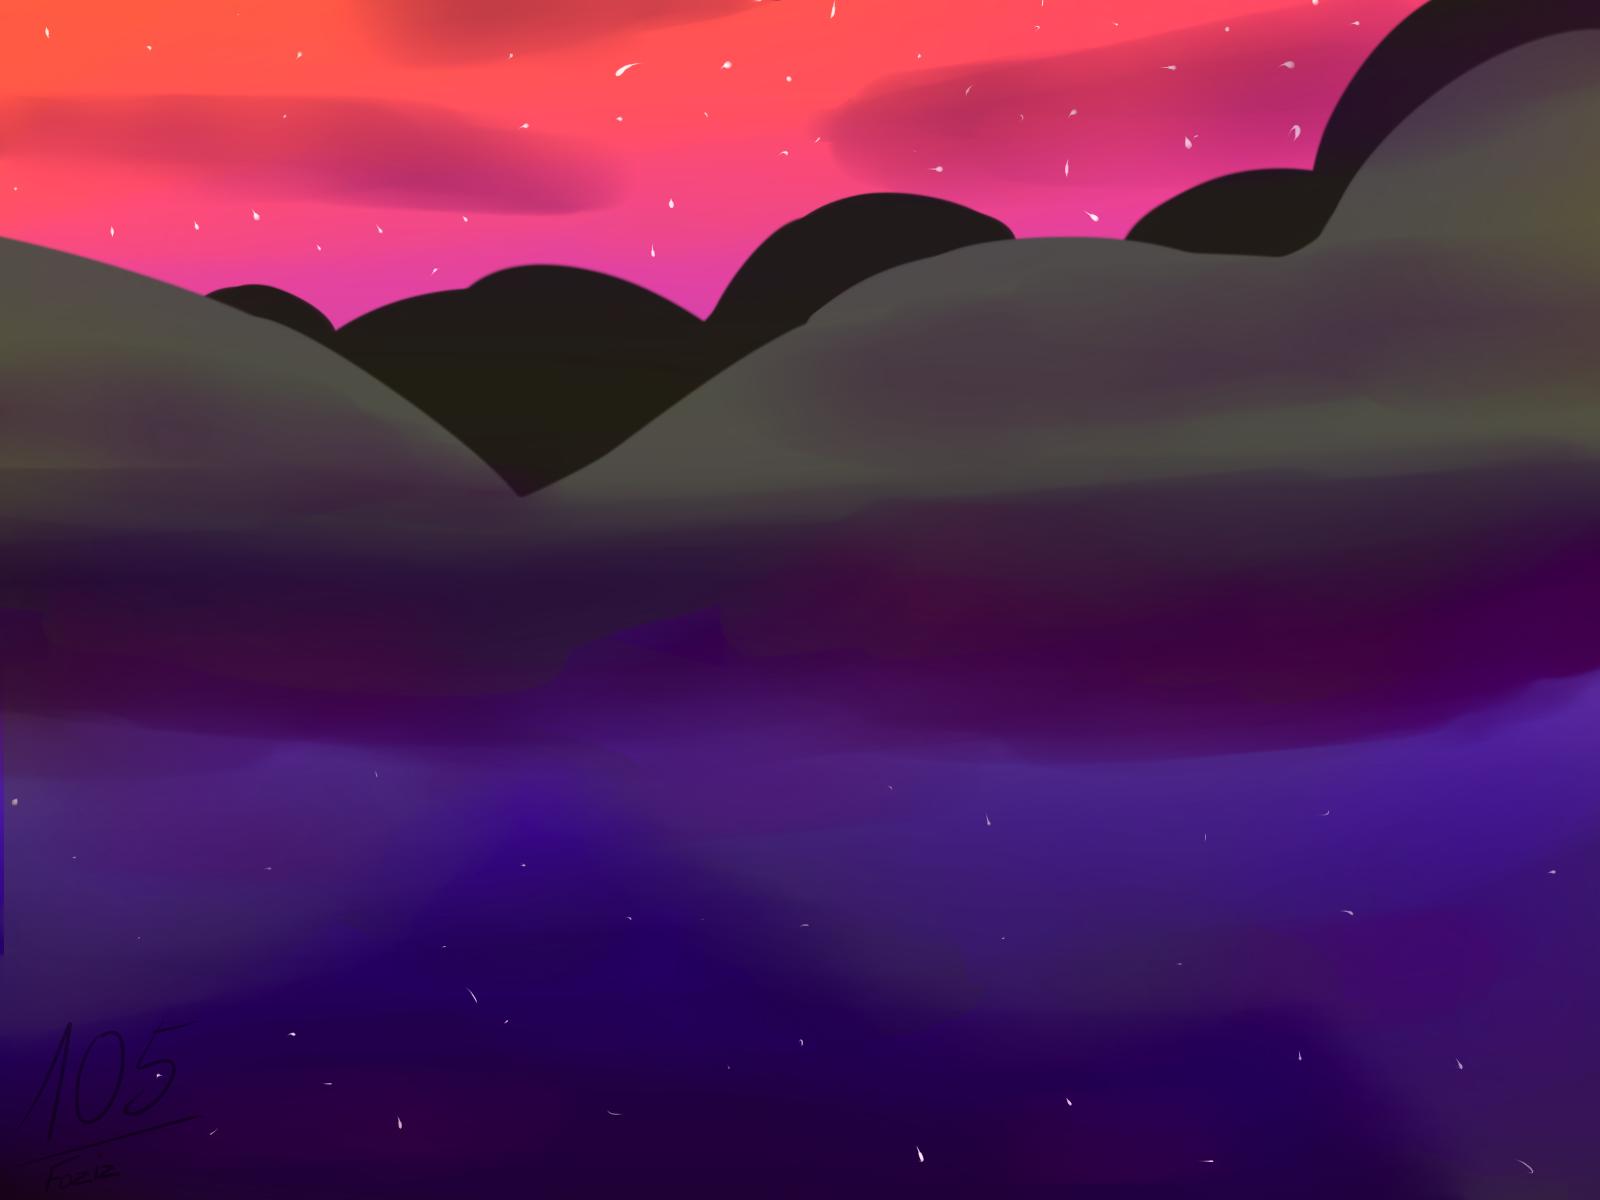 Sunset Fields [Dimension Ytram] by Foziz105